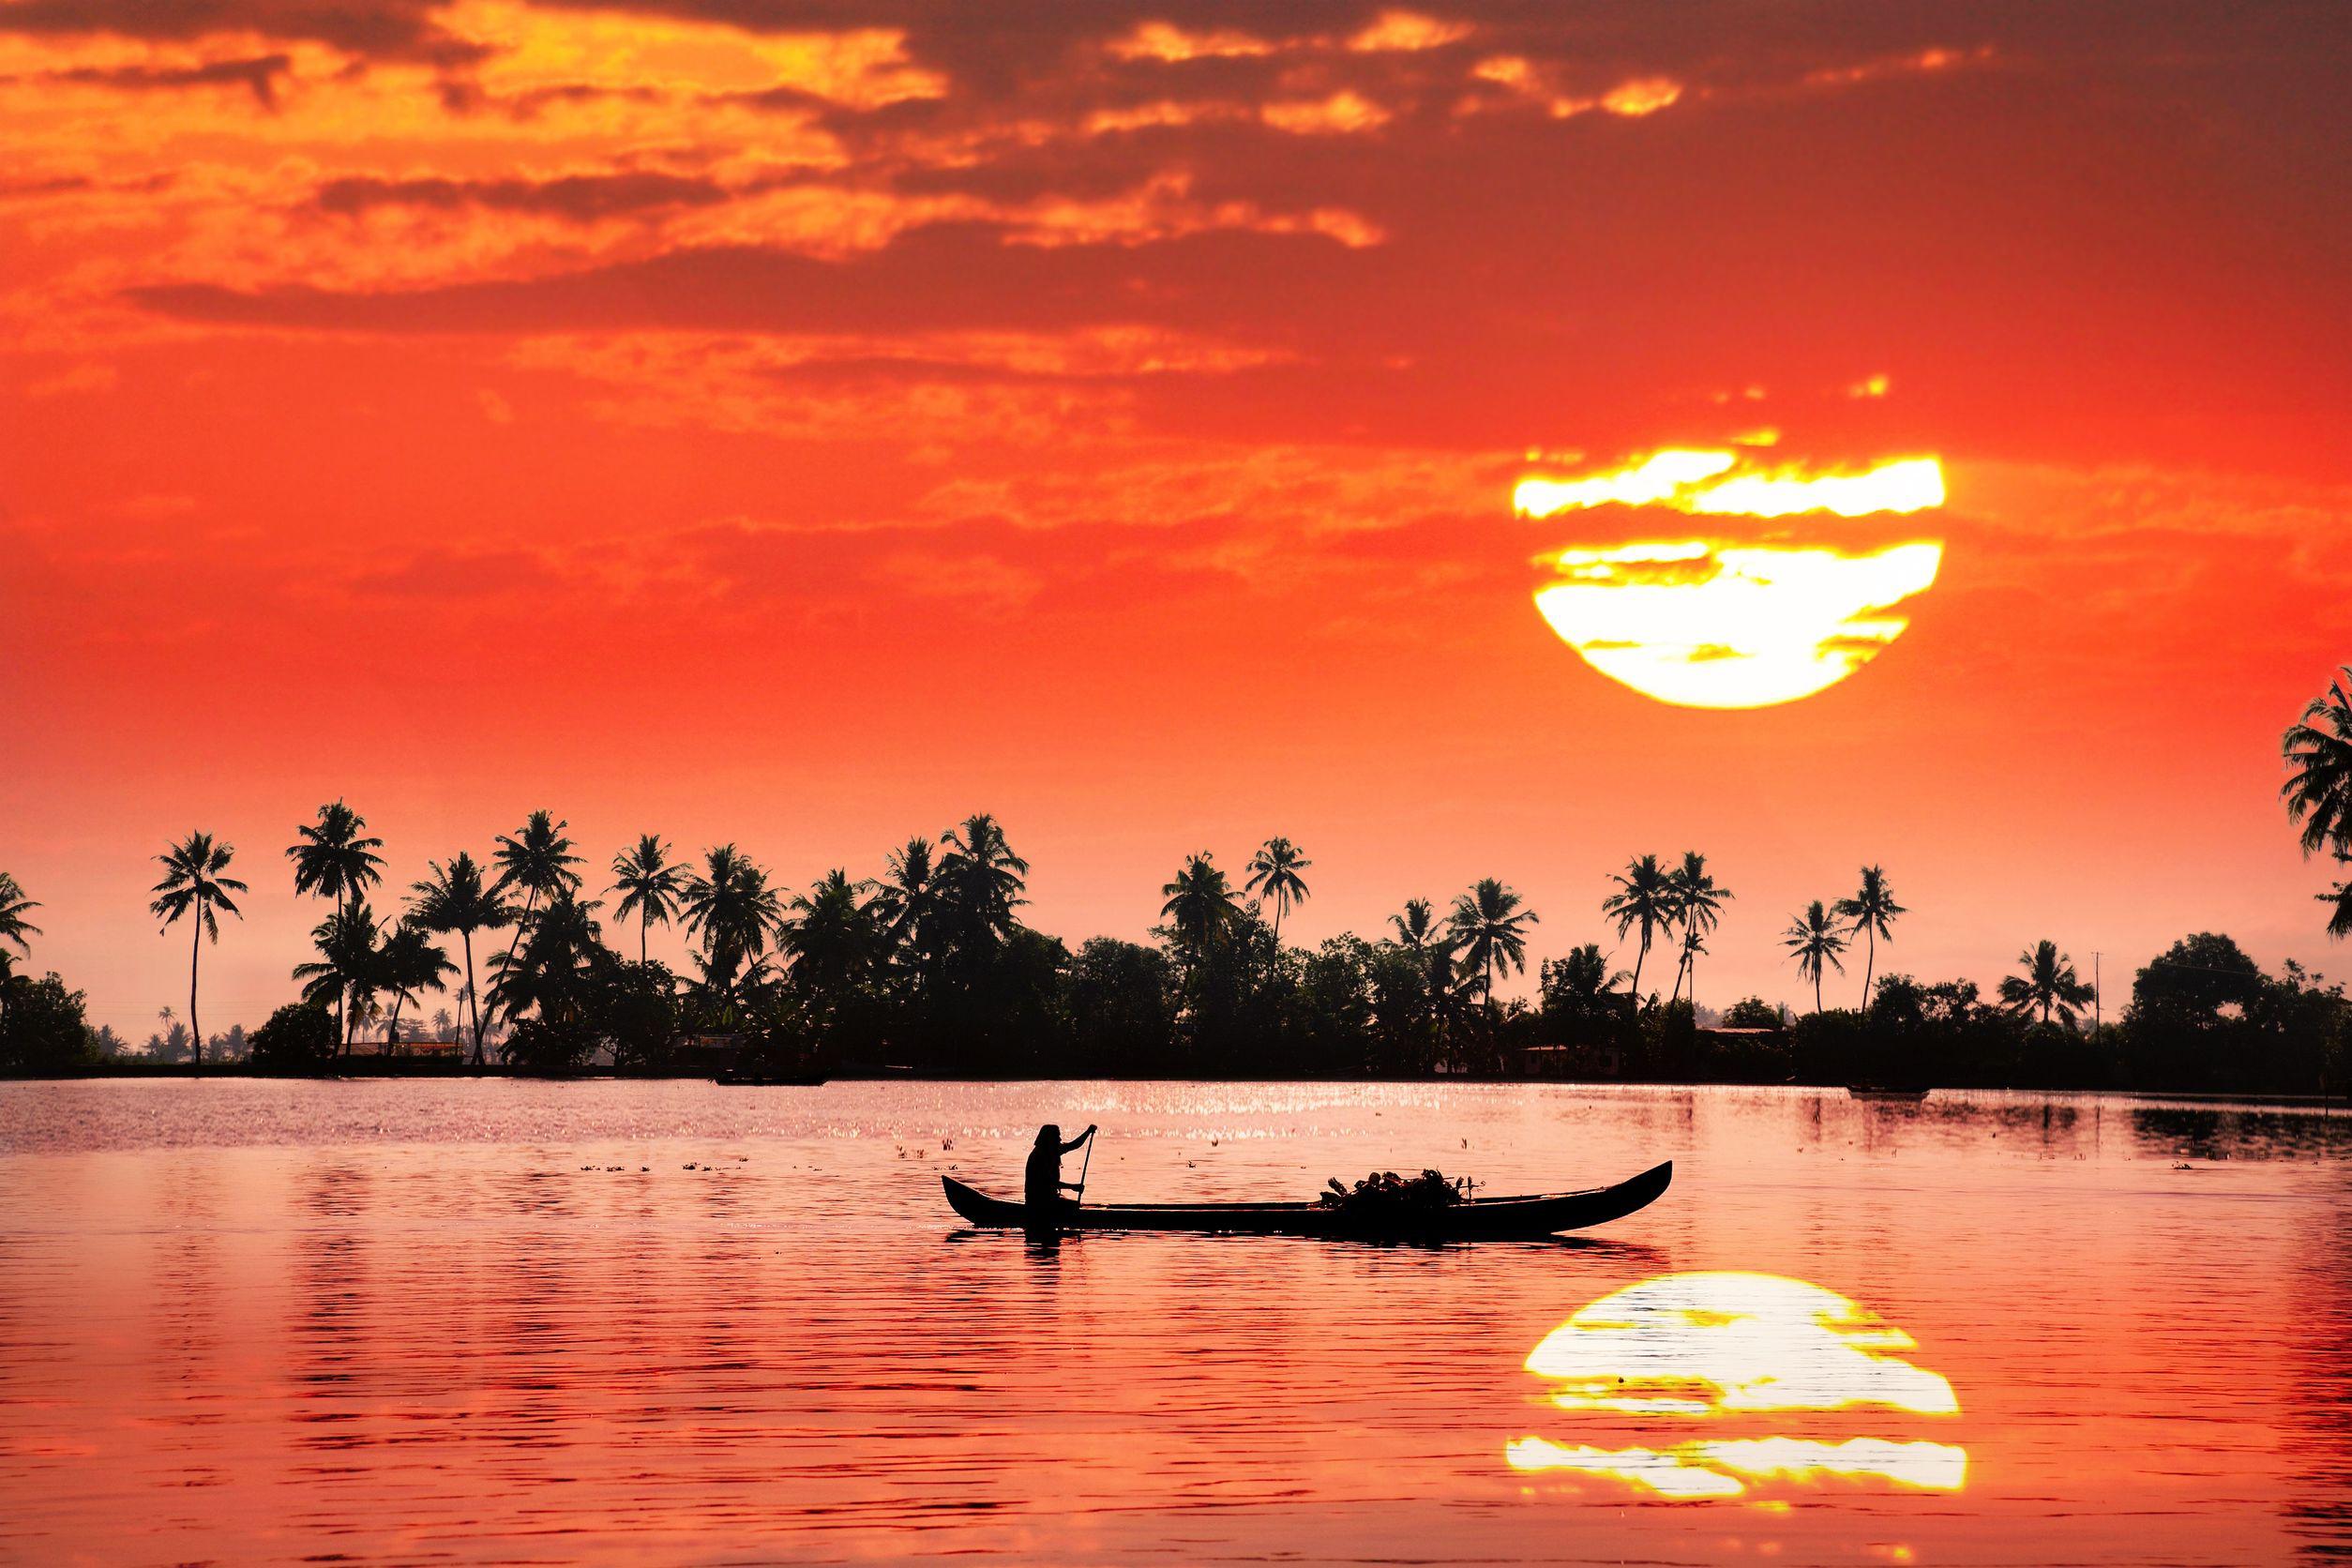 Rivers of Asia - China, Vietnam, Burma & Kerala - Oyster